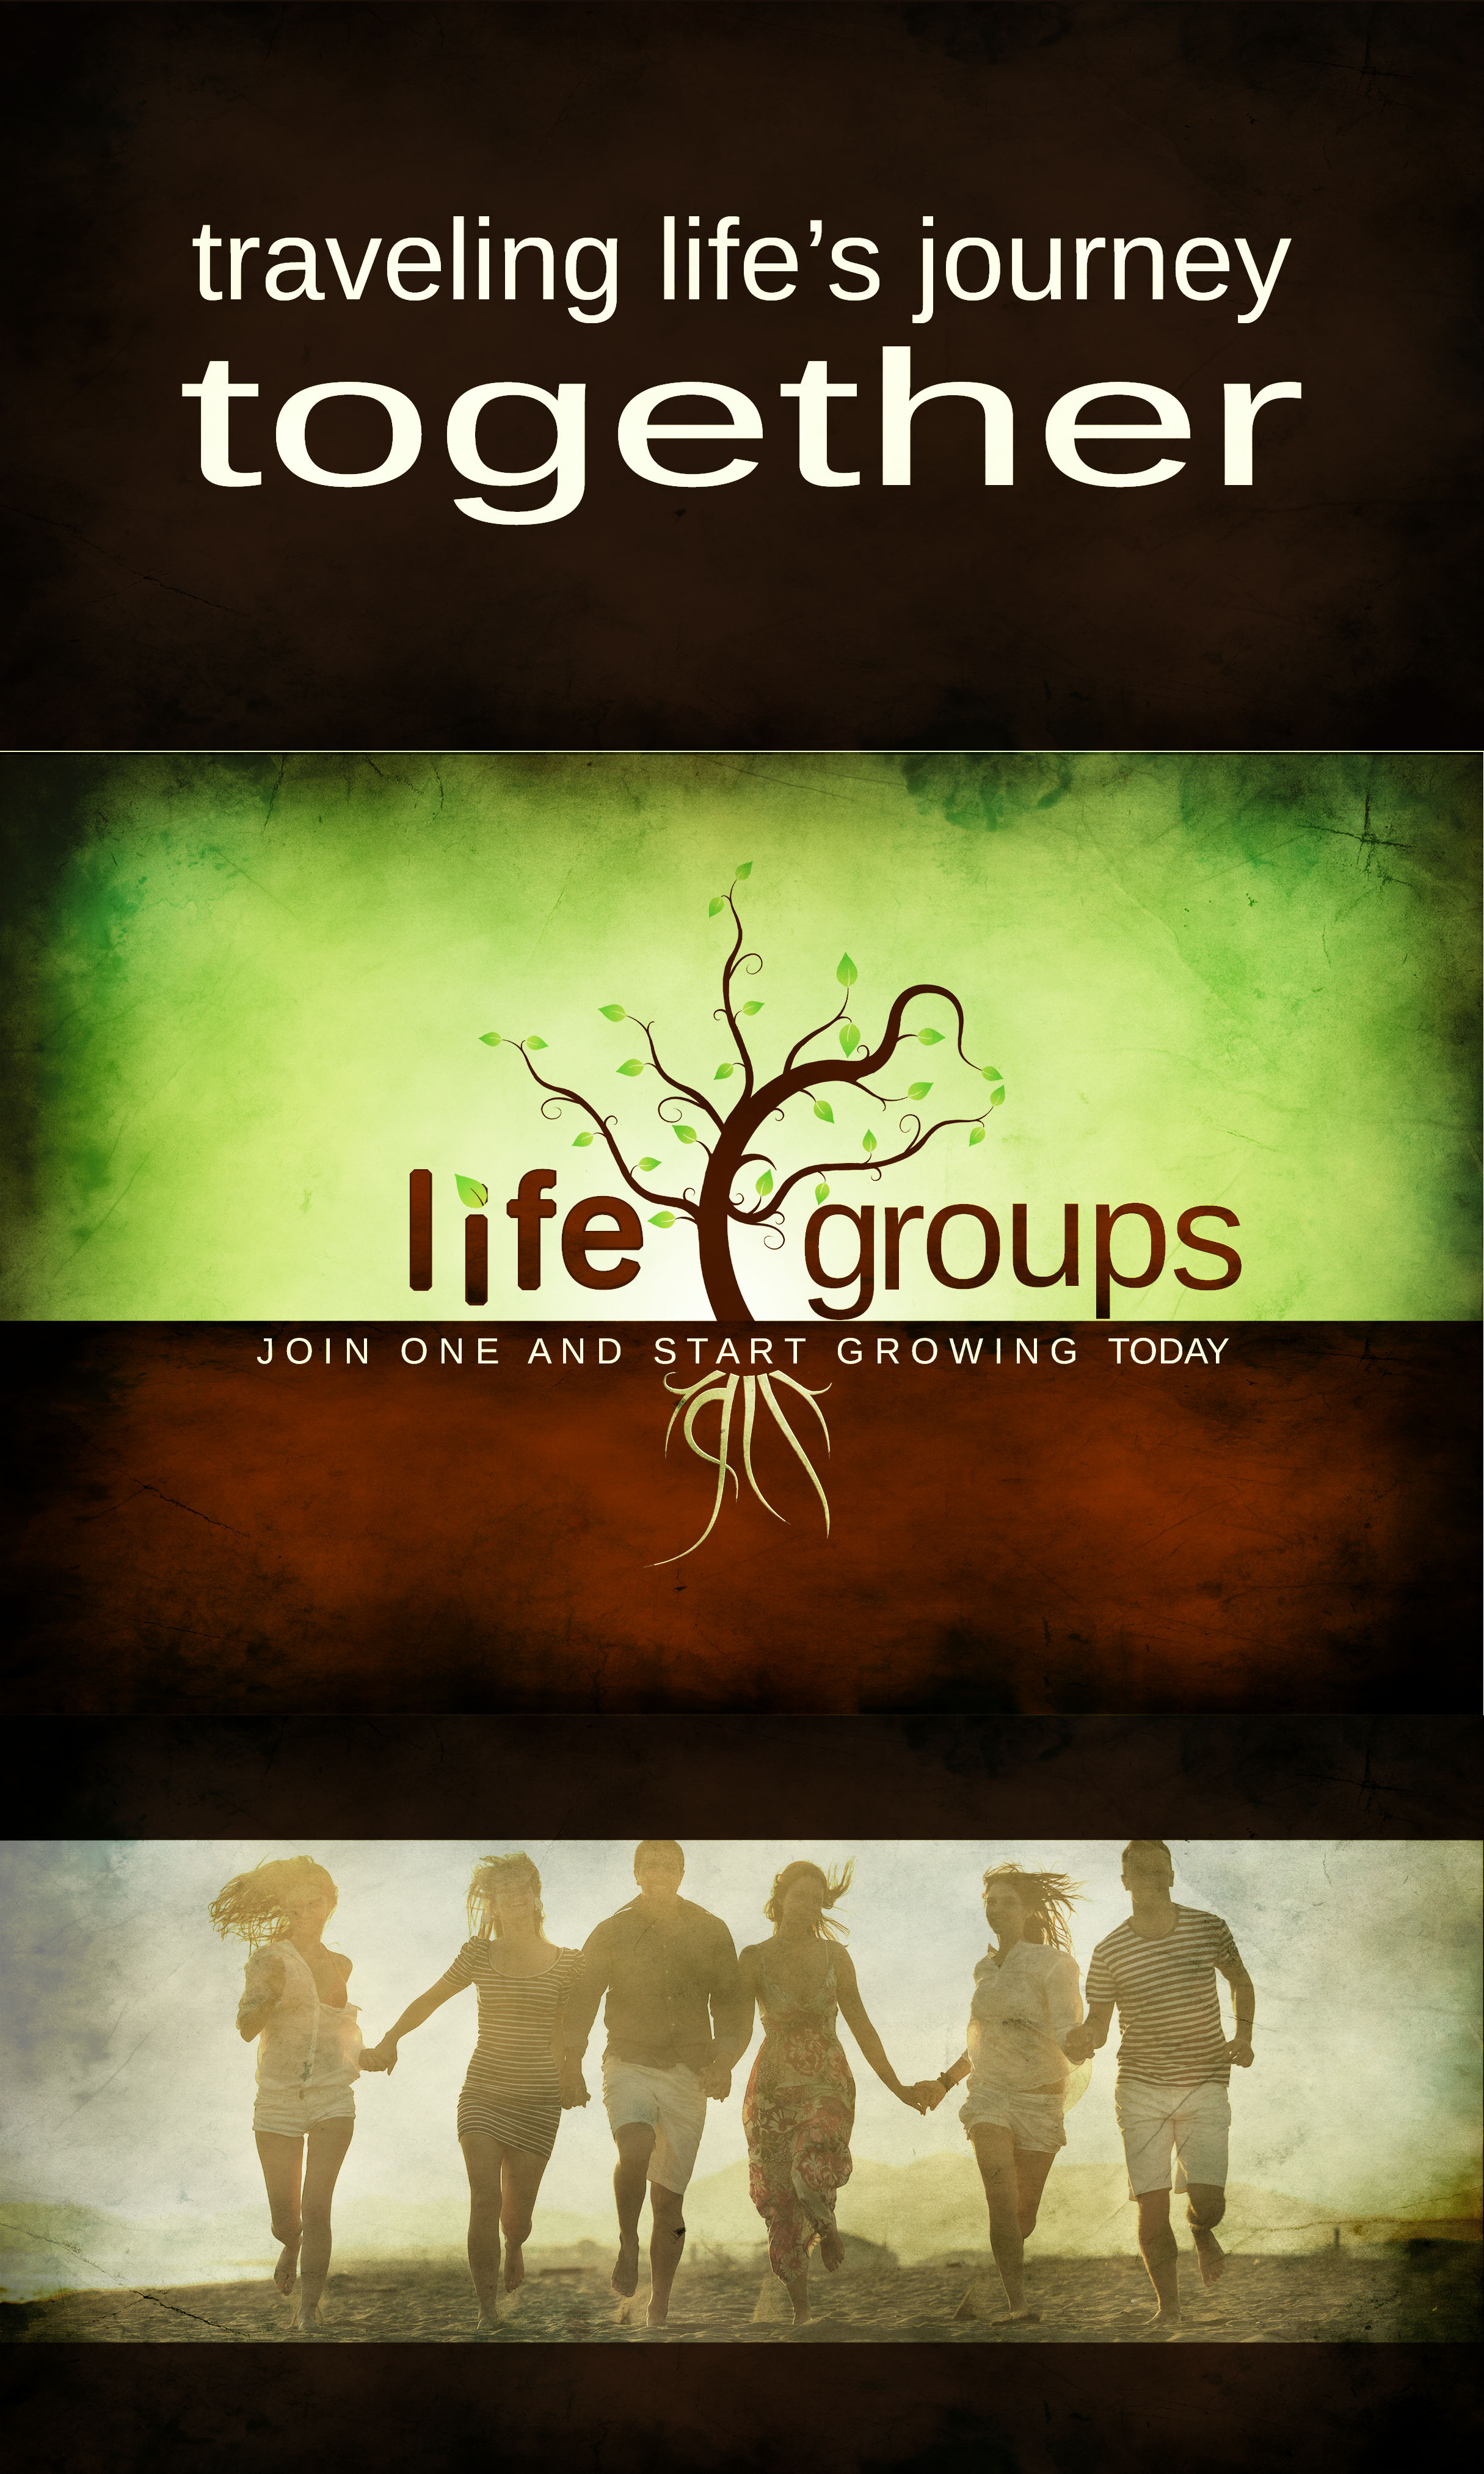 life groups banner small.jpg